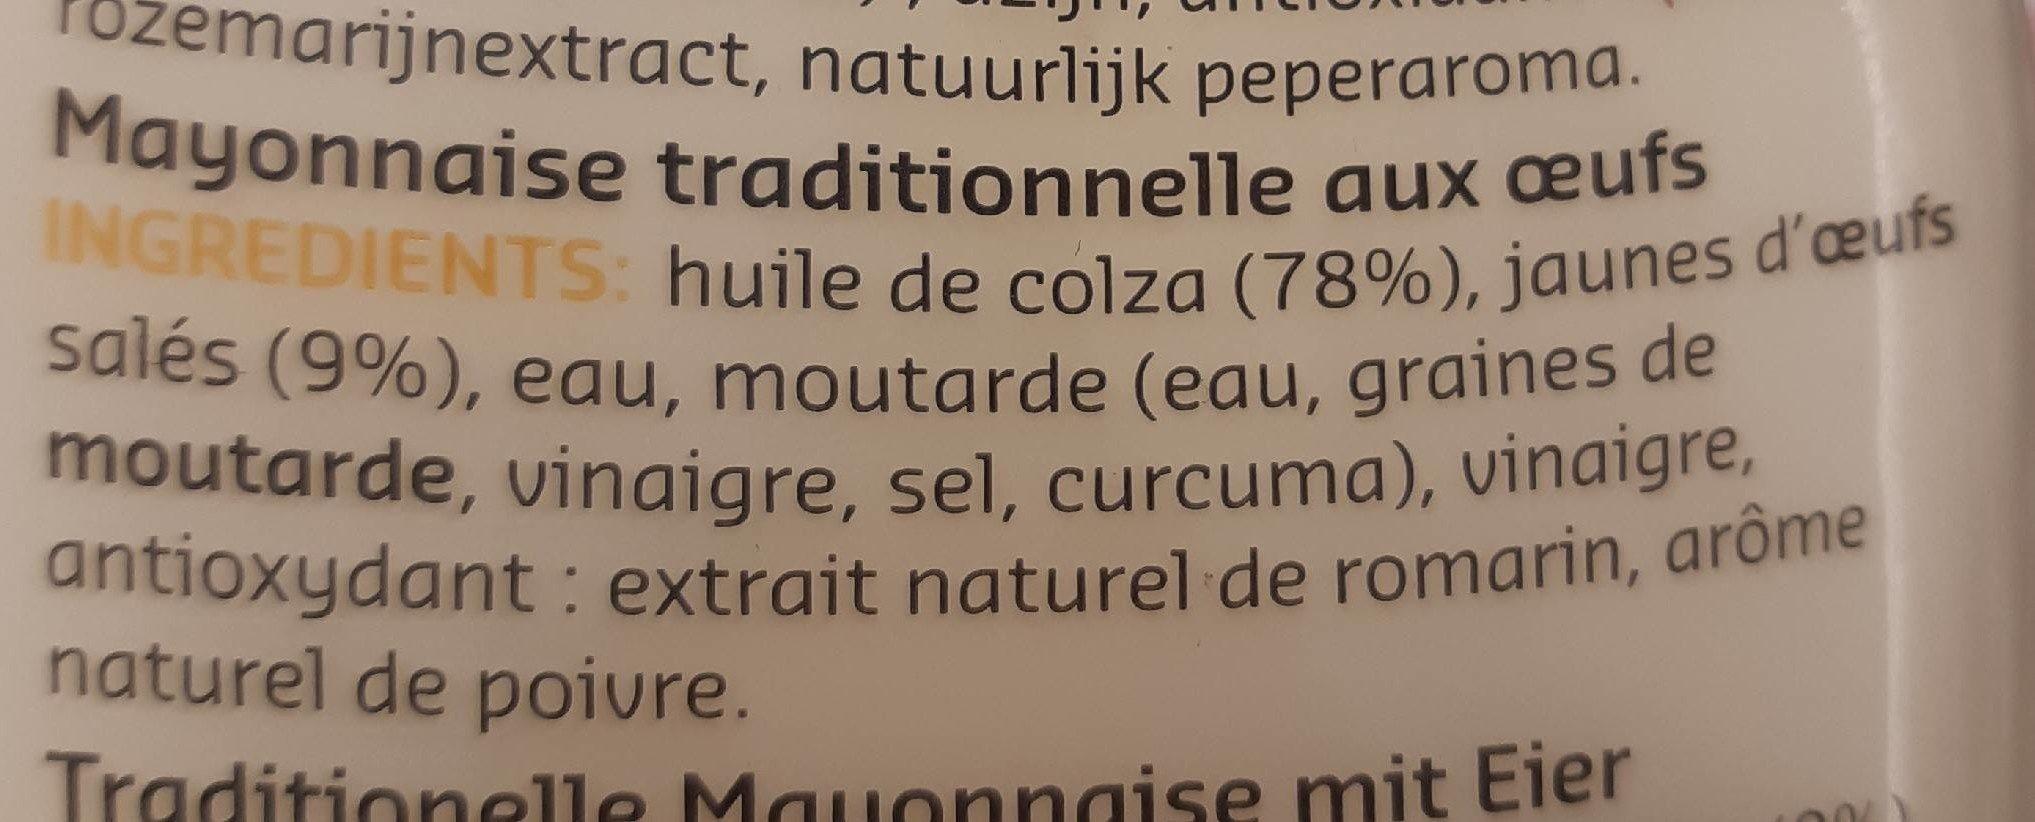 Mayonnaise aux oeufs - Ingrediënten - fr